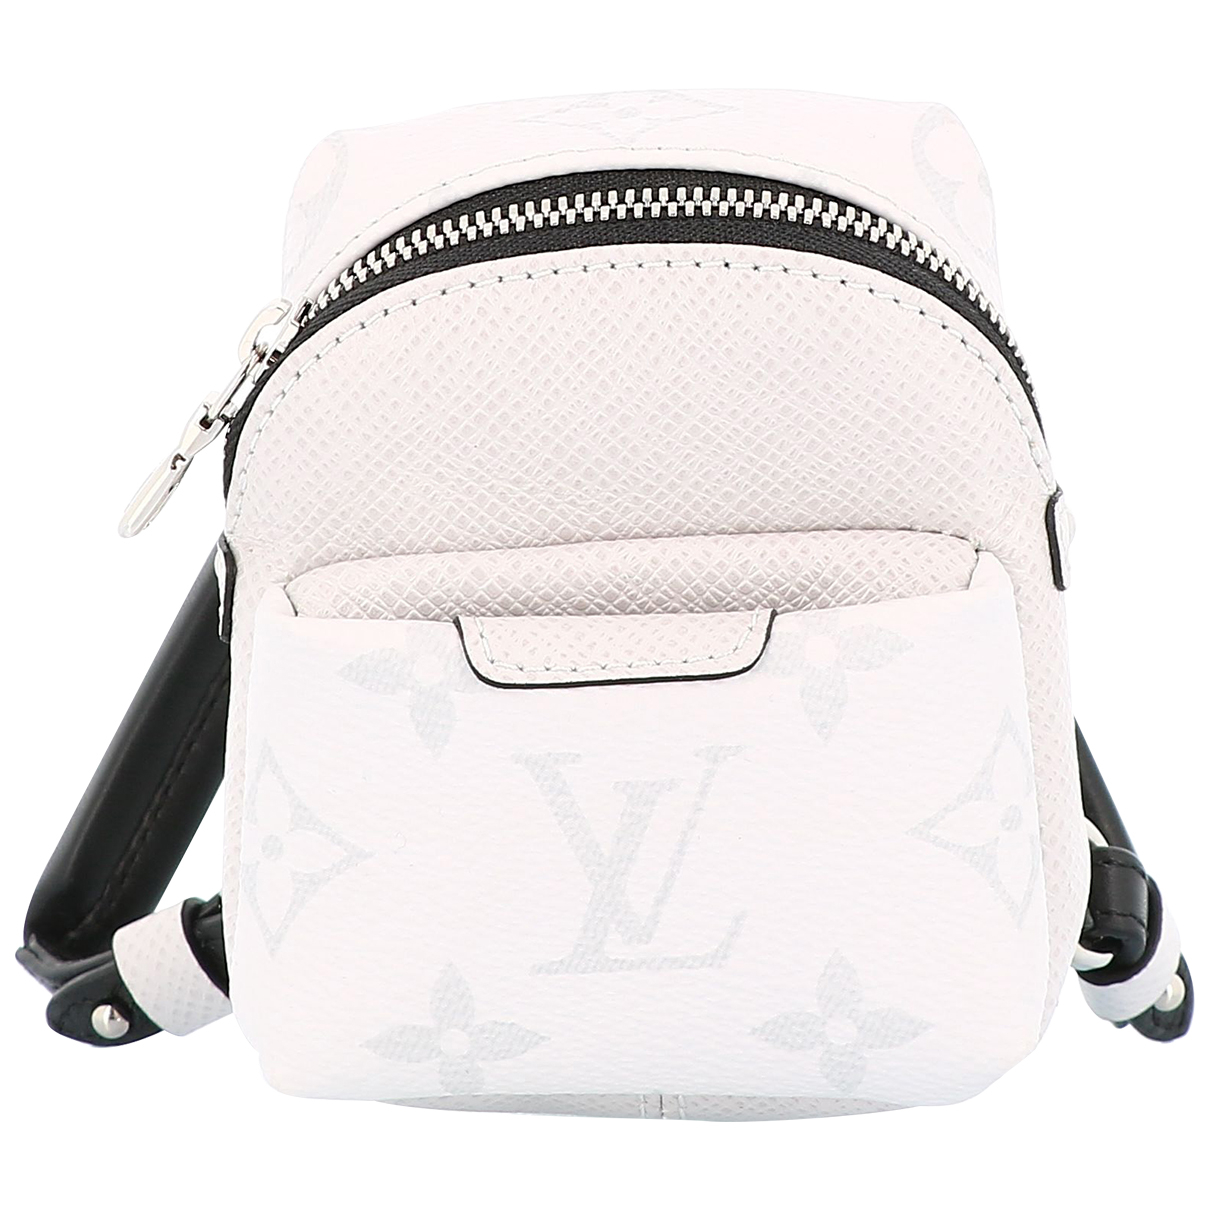 Louis Vuitton N White Cloth Purses, wallet & cases for Women N